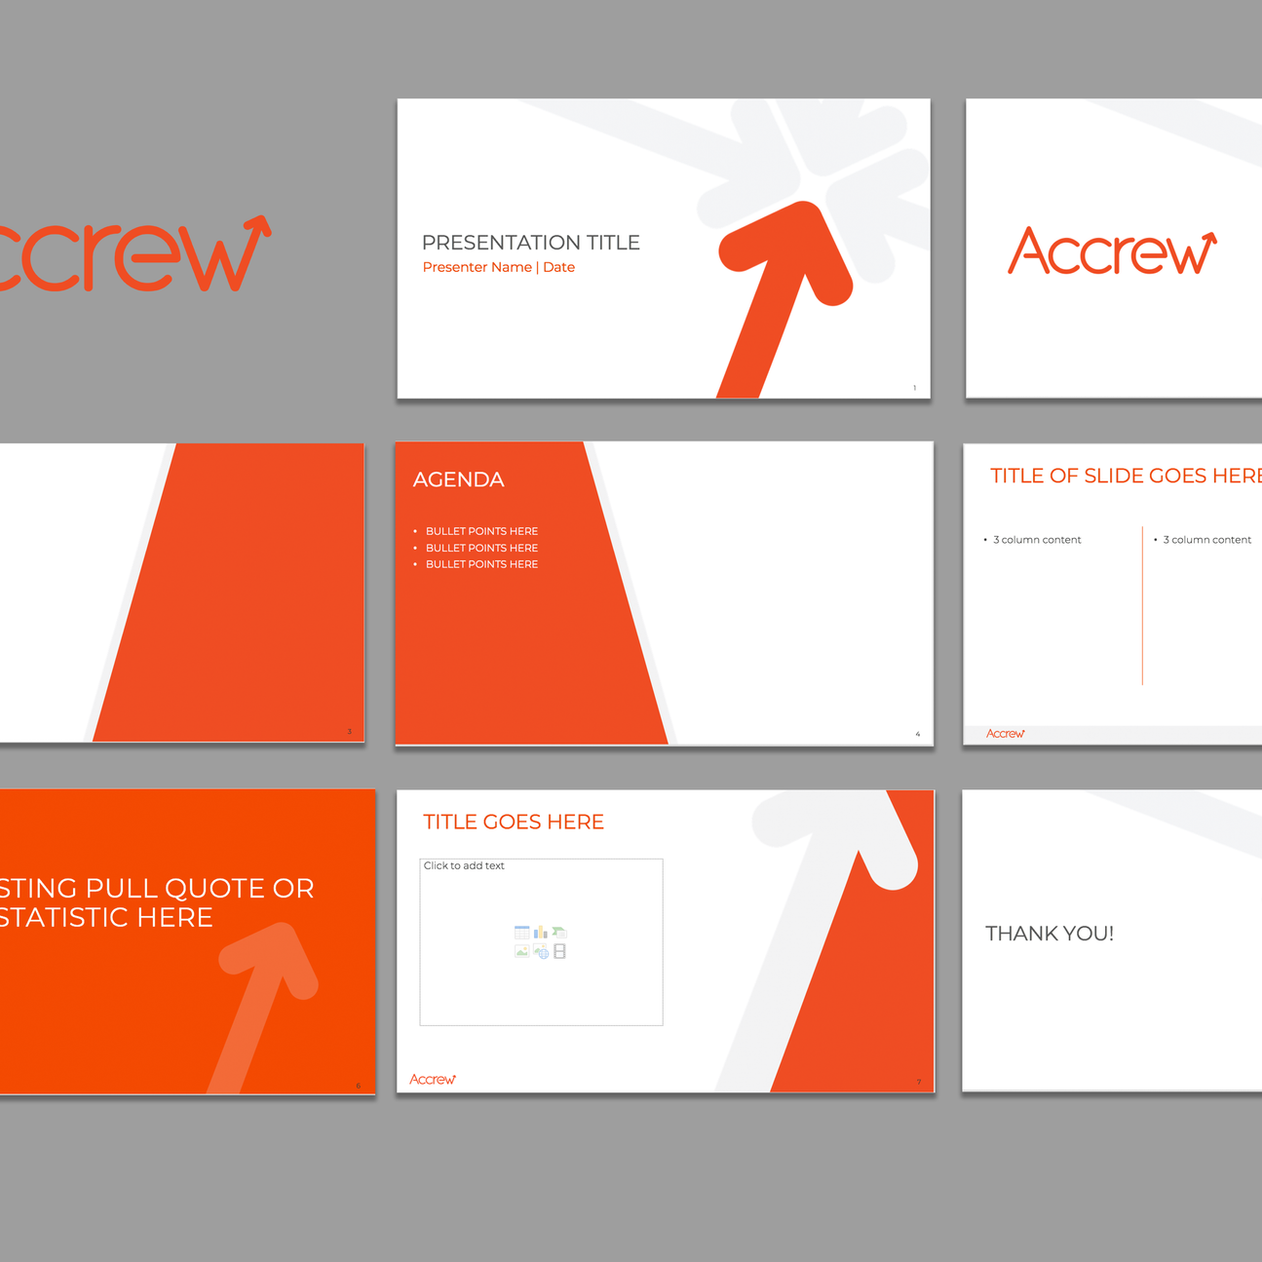 Accrew Customized Powerpoint